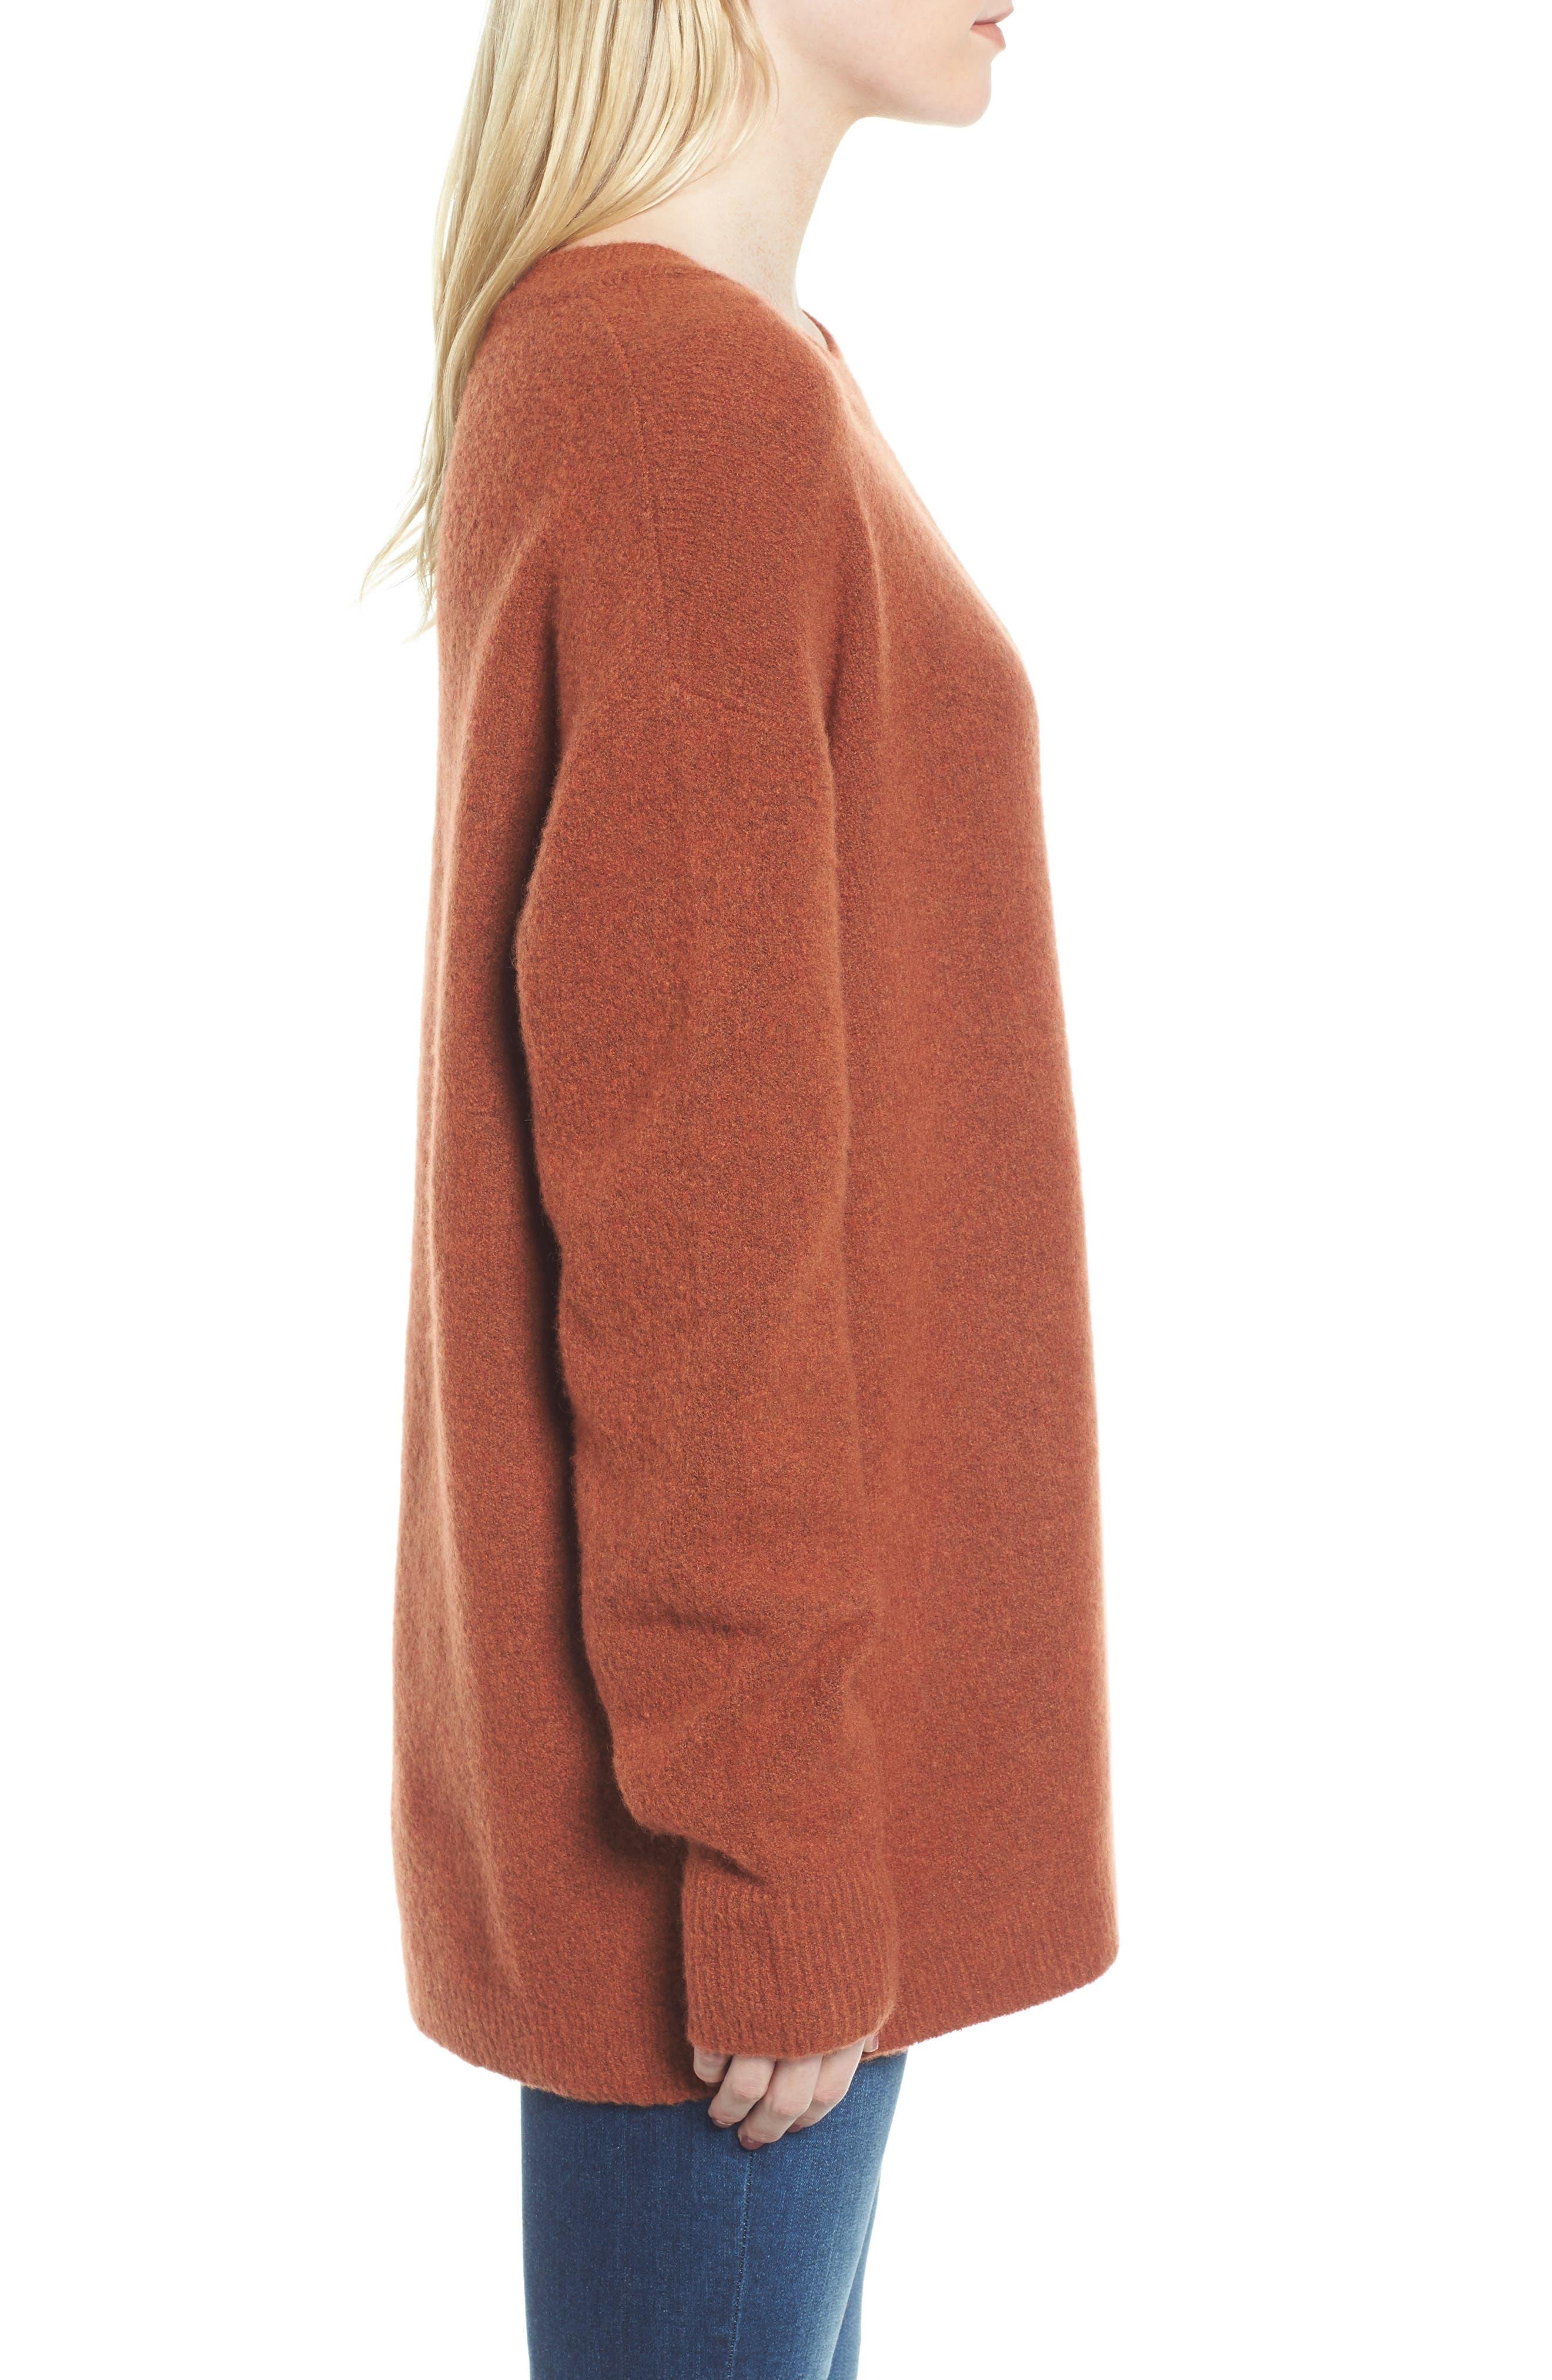 Alternate Image 3  - James Perse Oversize Cashmere Sweater